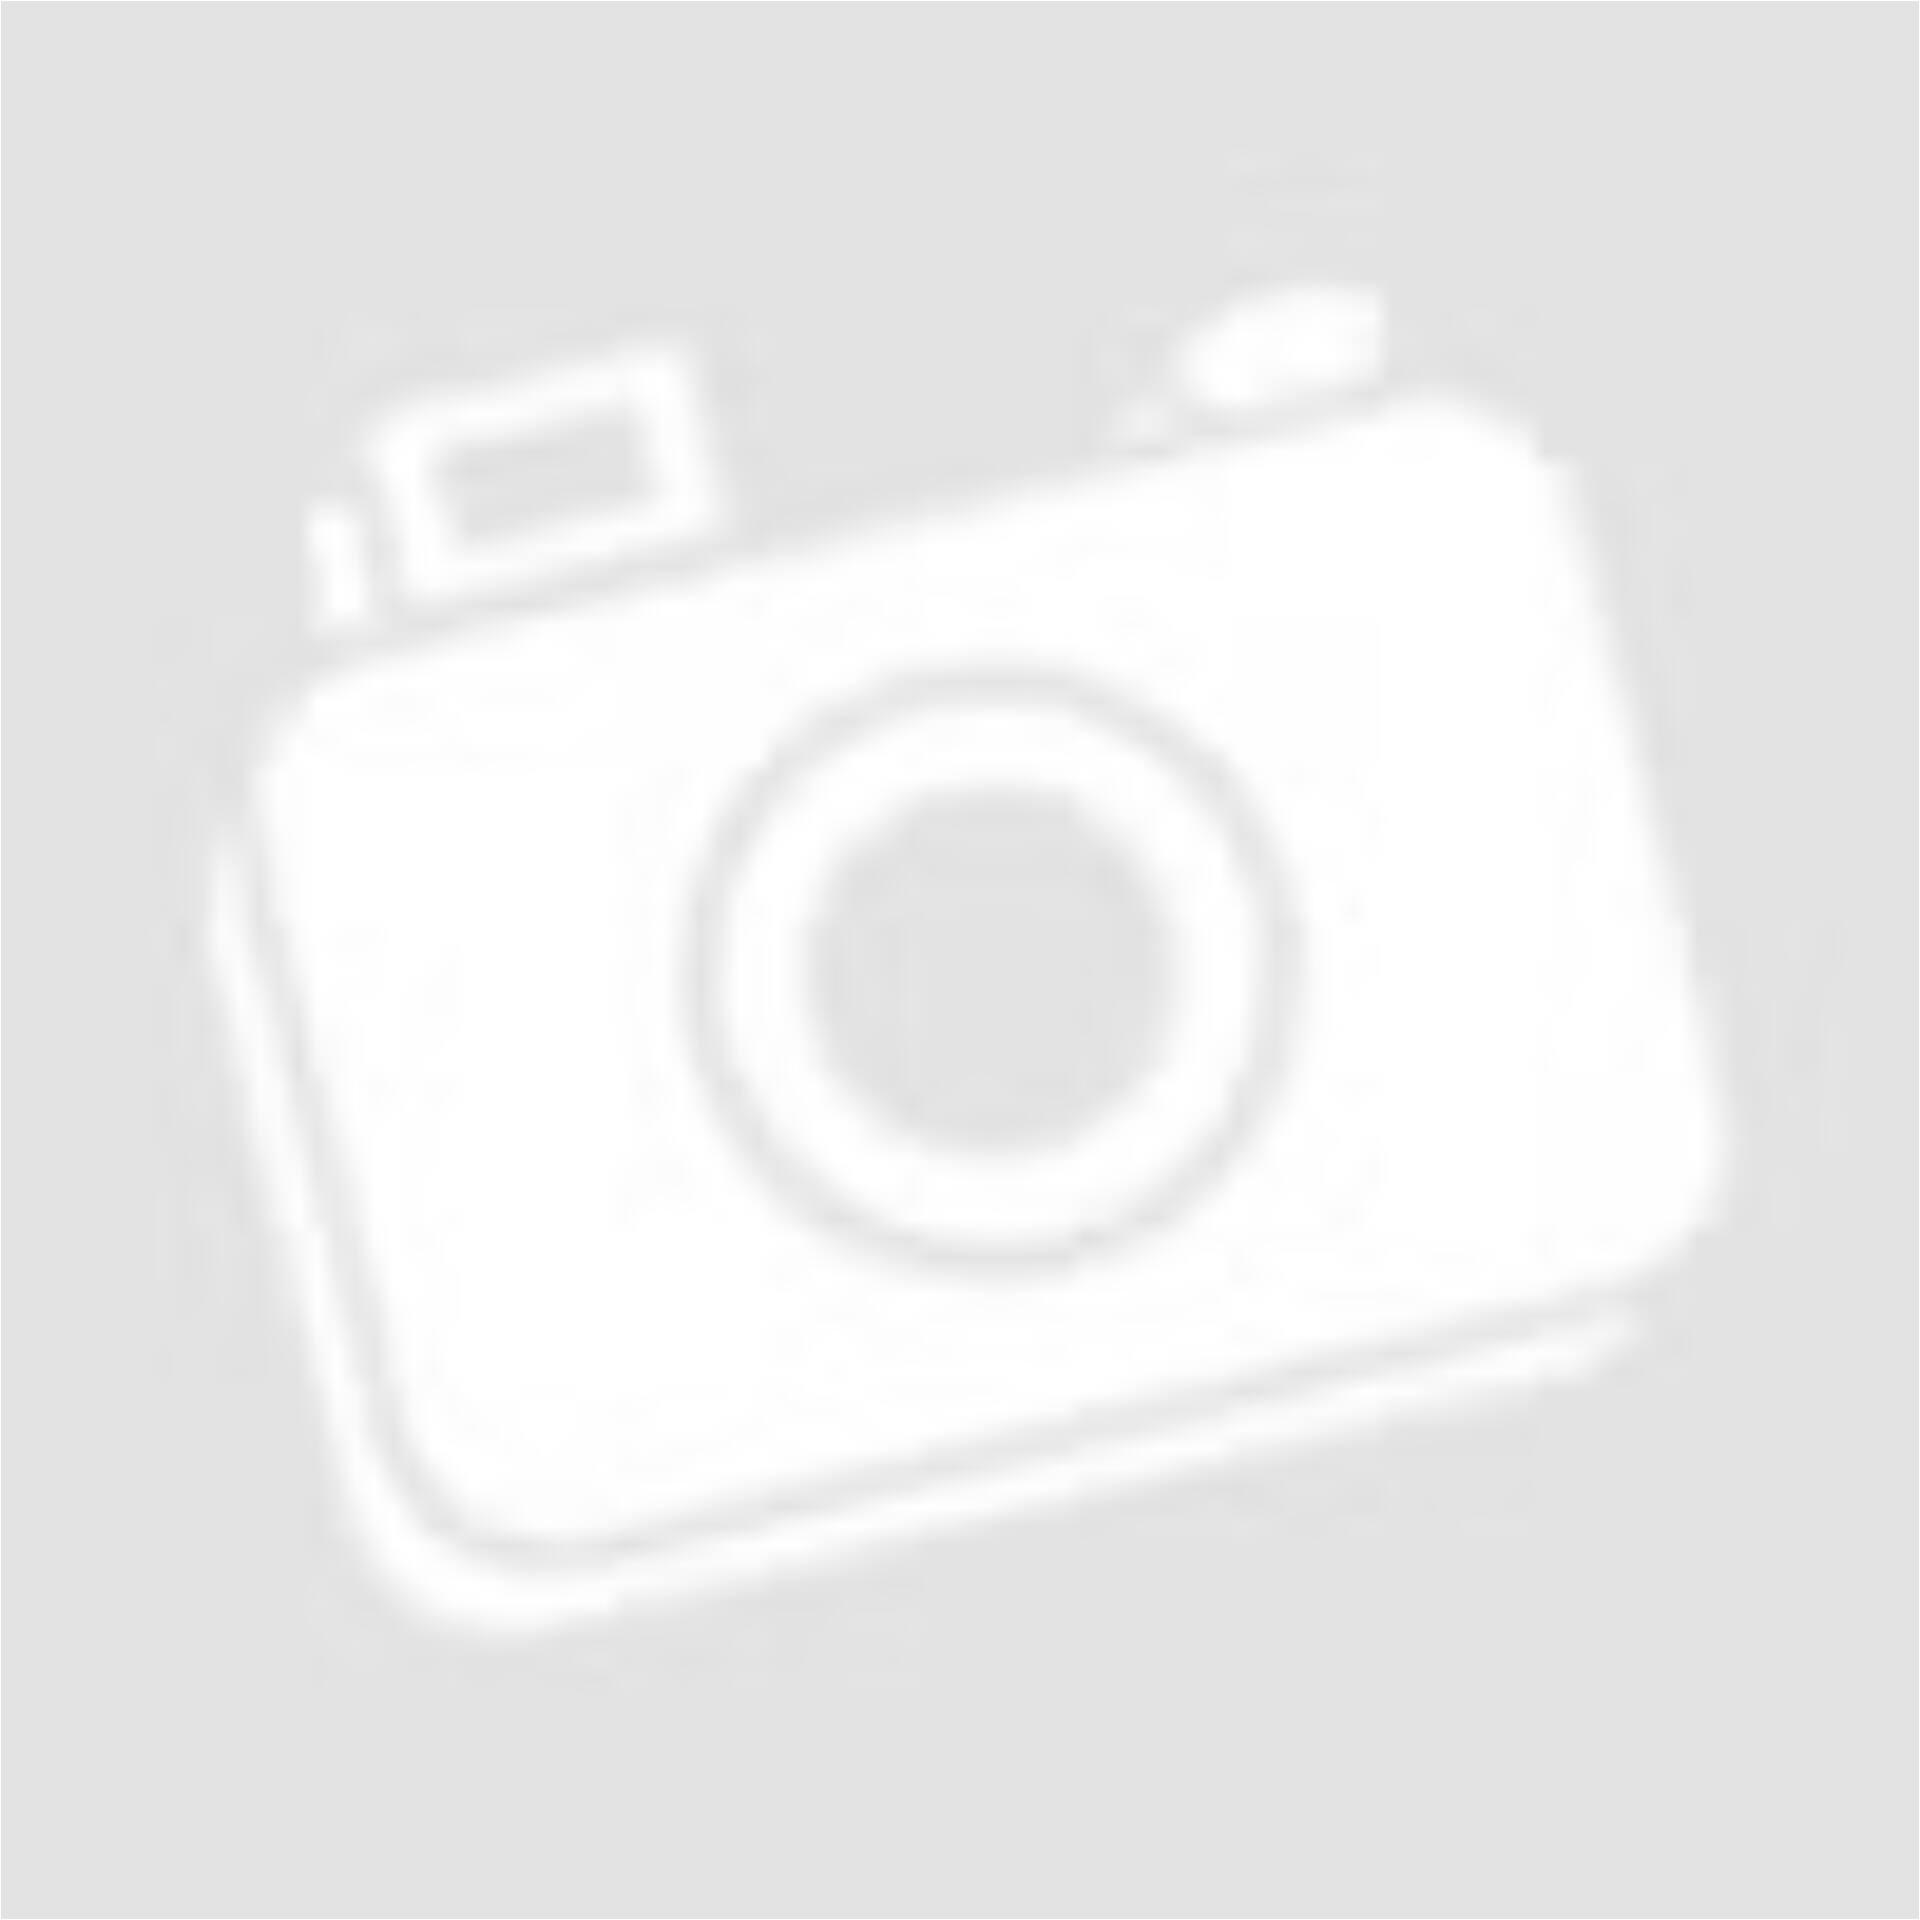 JUMEX barna magassarkú cipő (Méret  38) - Magassarkú - Öltözz ki ... 1f2e631b54